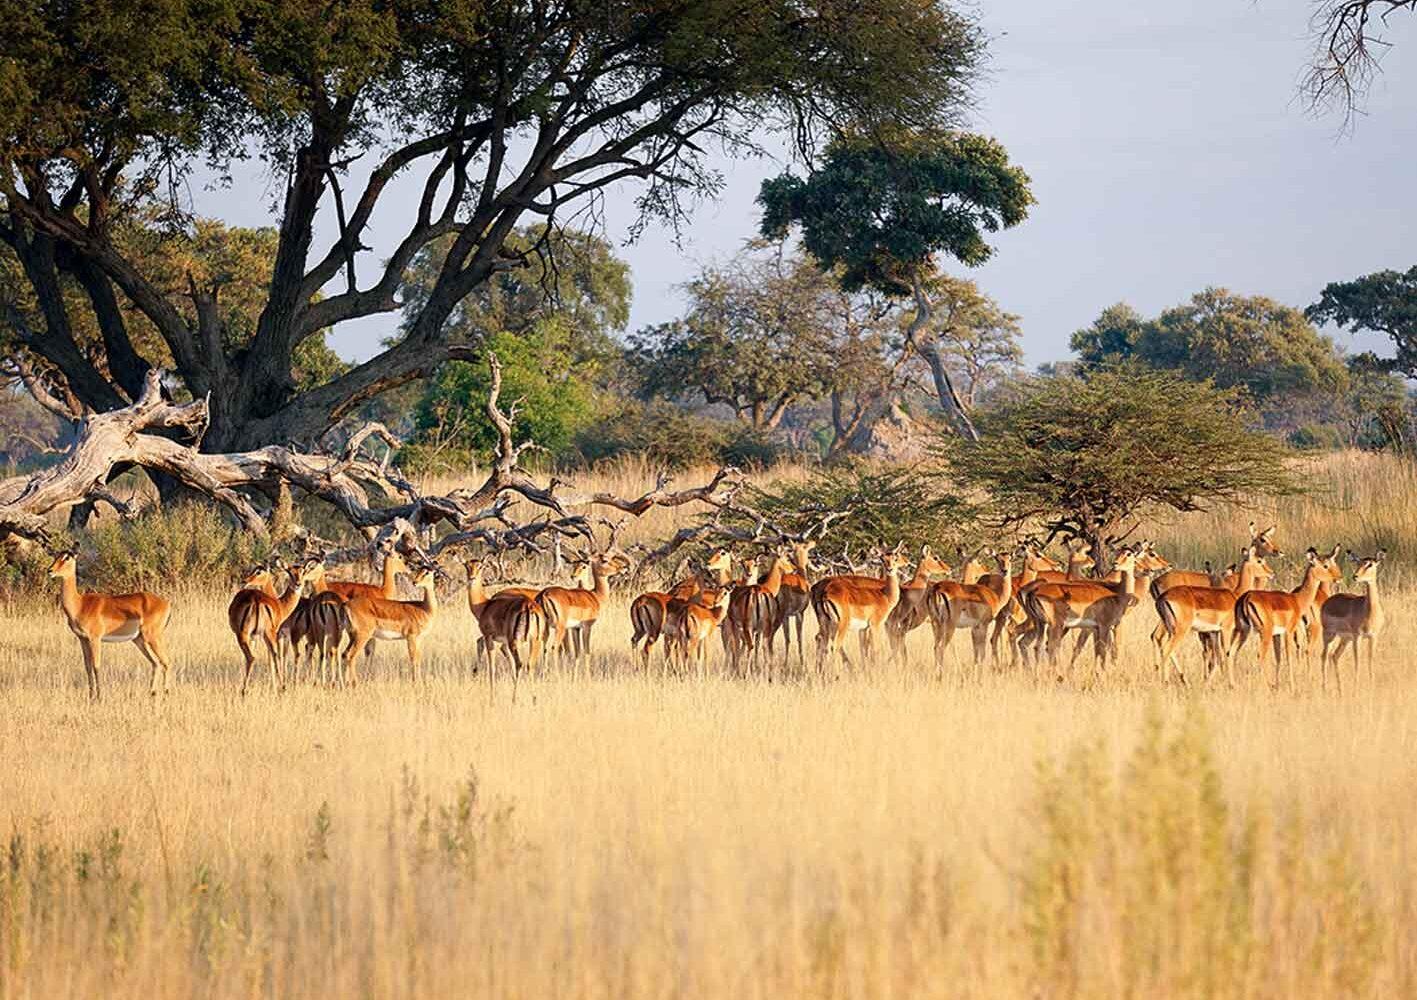 Impalas im Okawango-Delta, Botswana